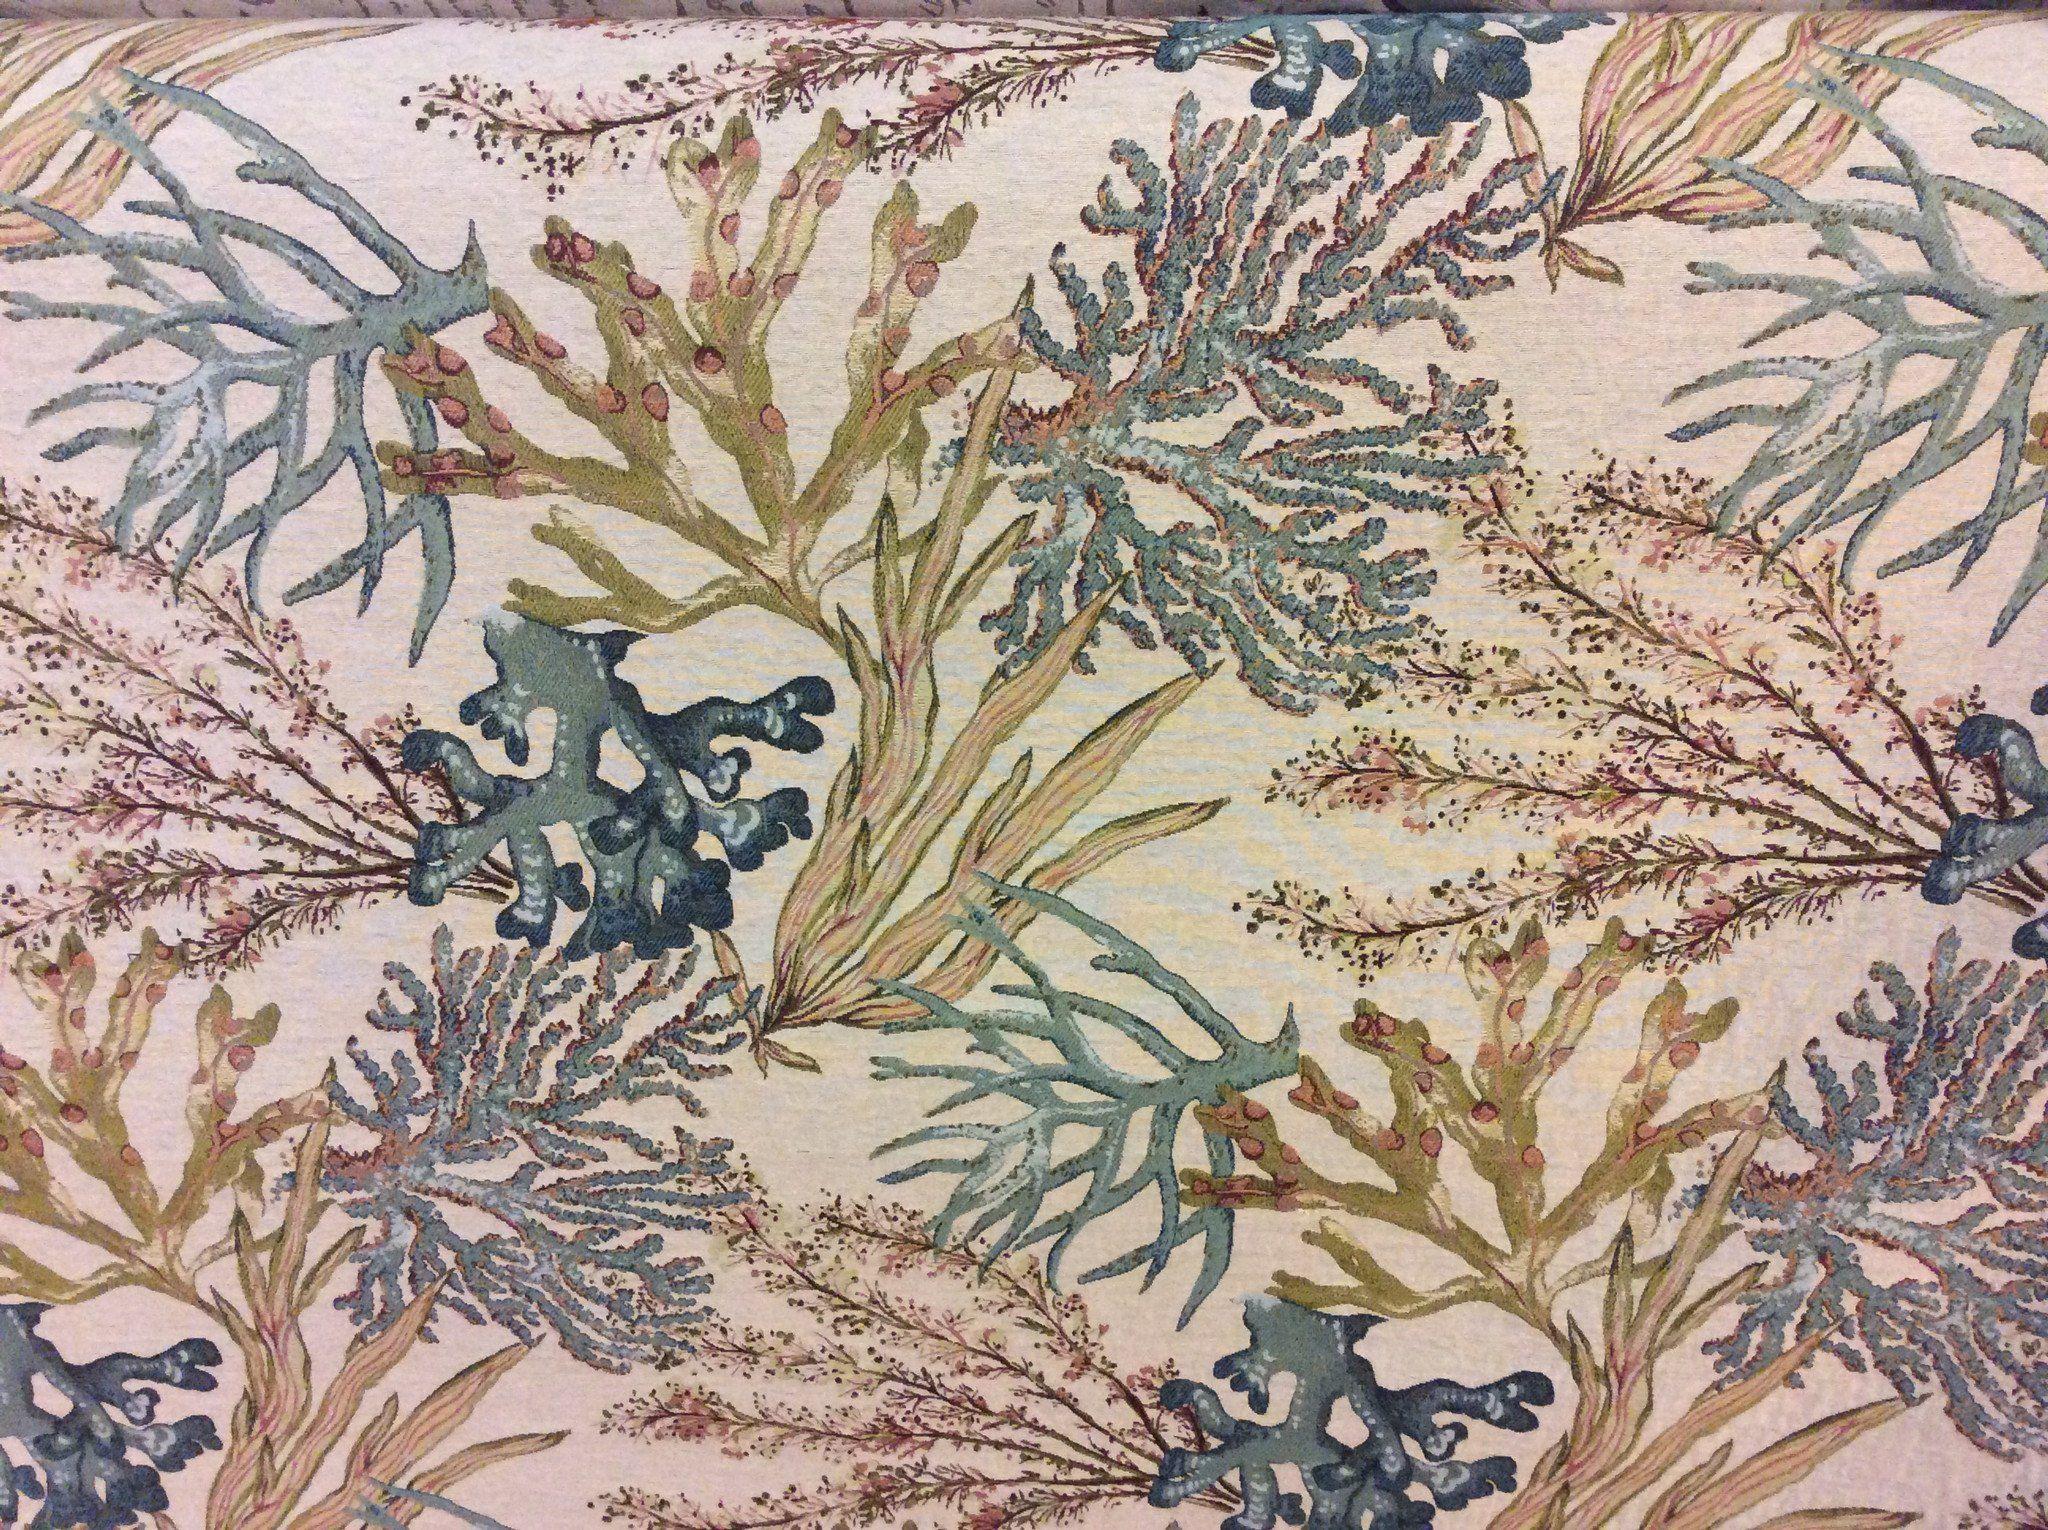 Calcutta Caribbean Decorative Upholstery Fabric Sold By The Yard Upholstery Fabric Fabric Decor Fabric